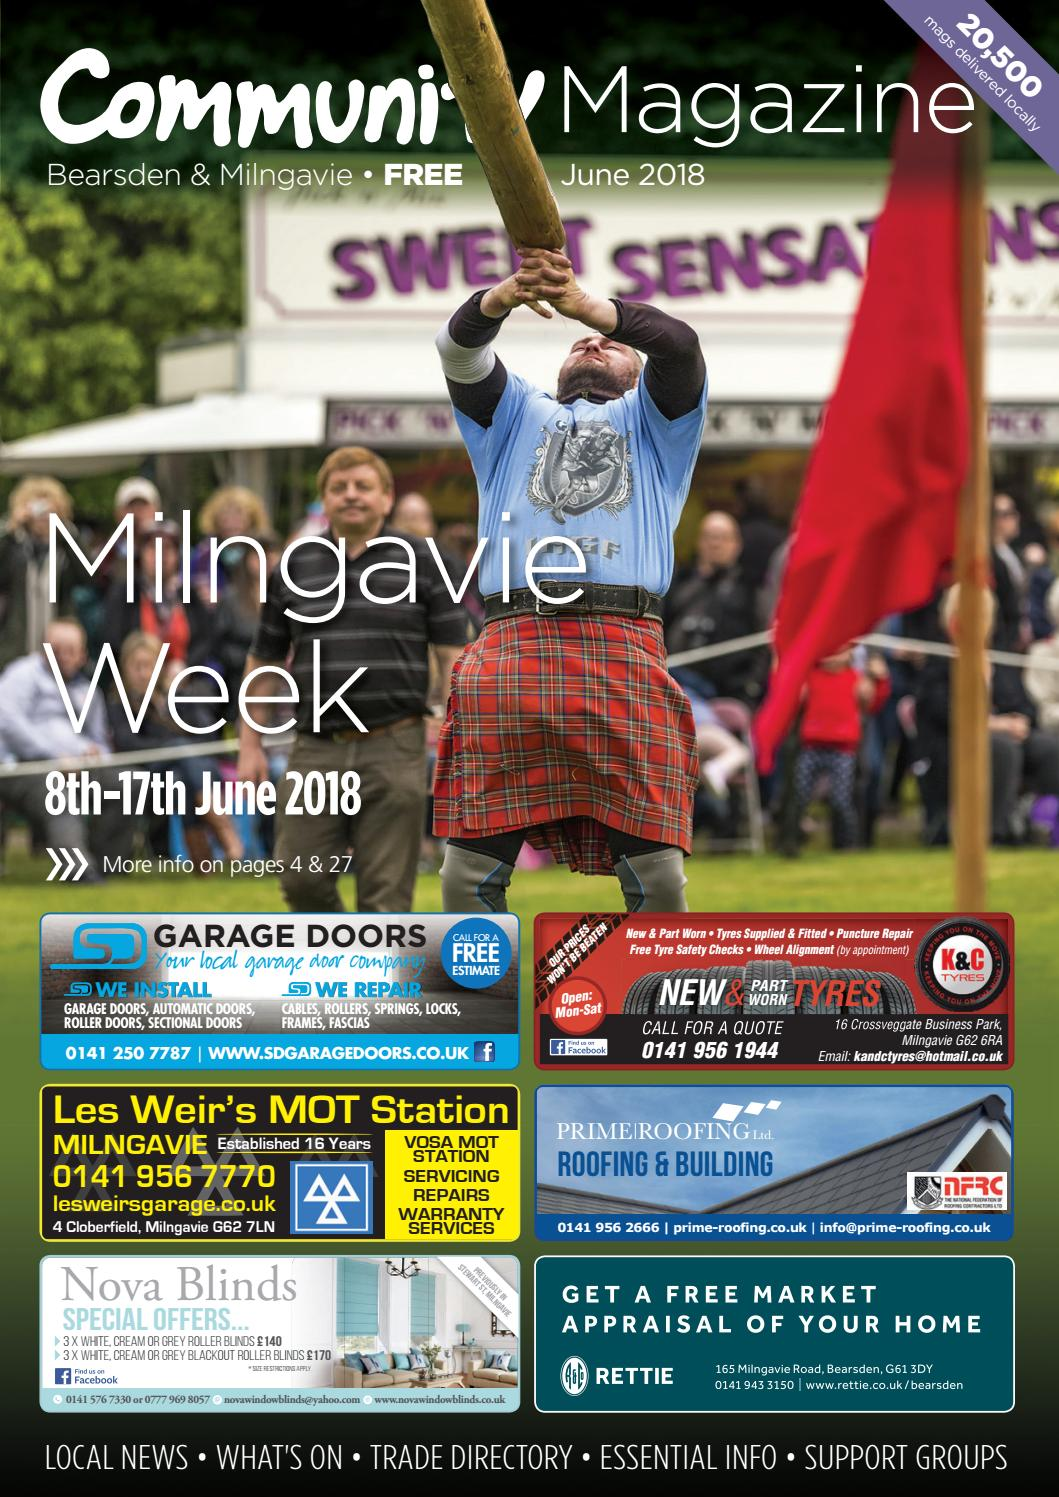 Bearsden Amp Milngavie Community Magazine June 2018 By